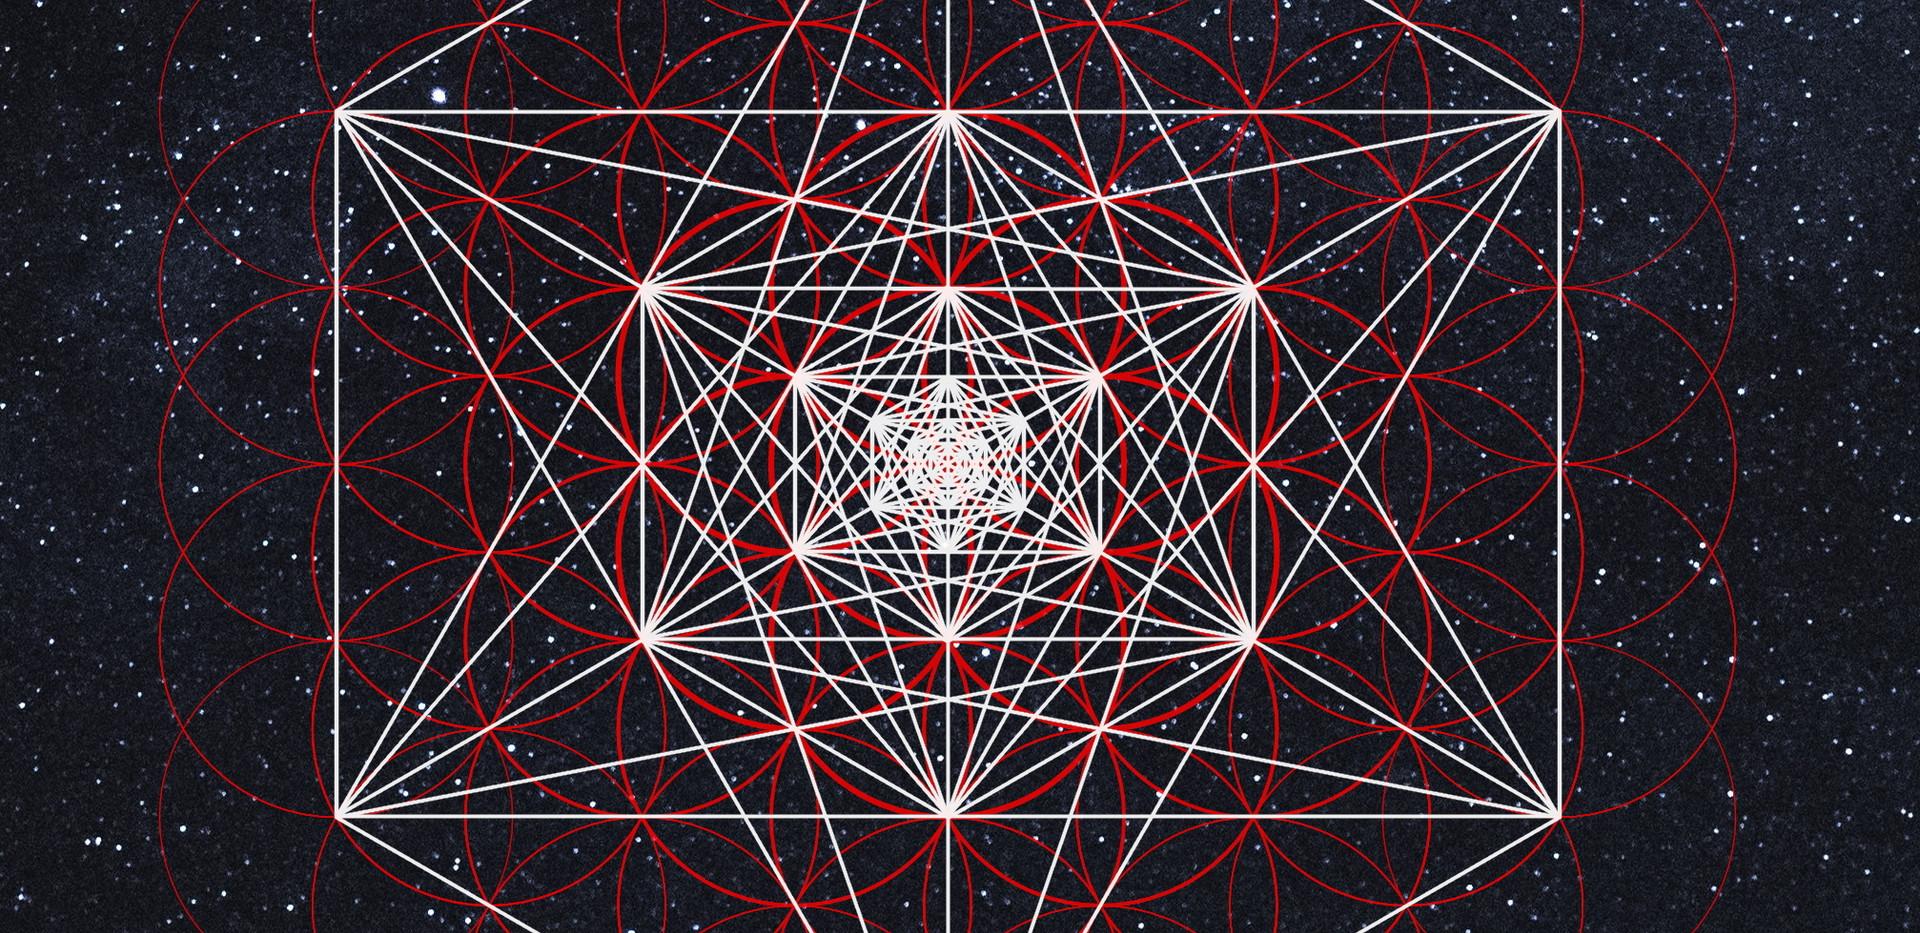 cube metatron.jpg